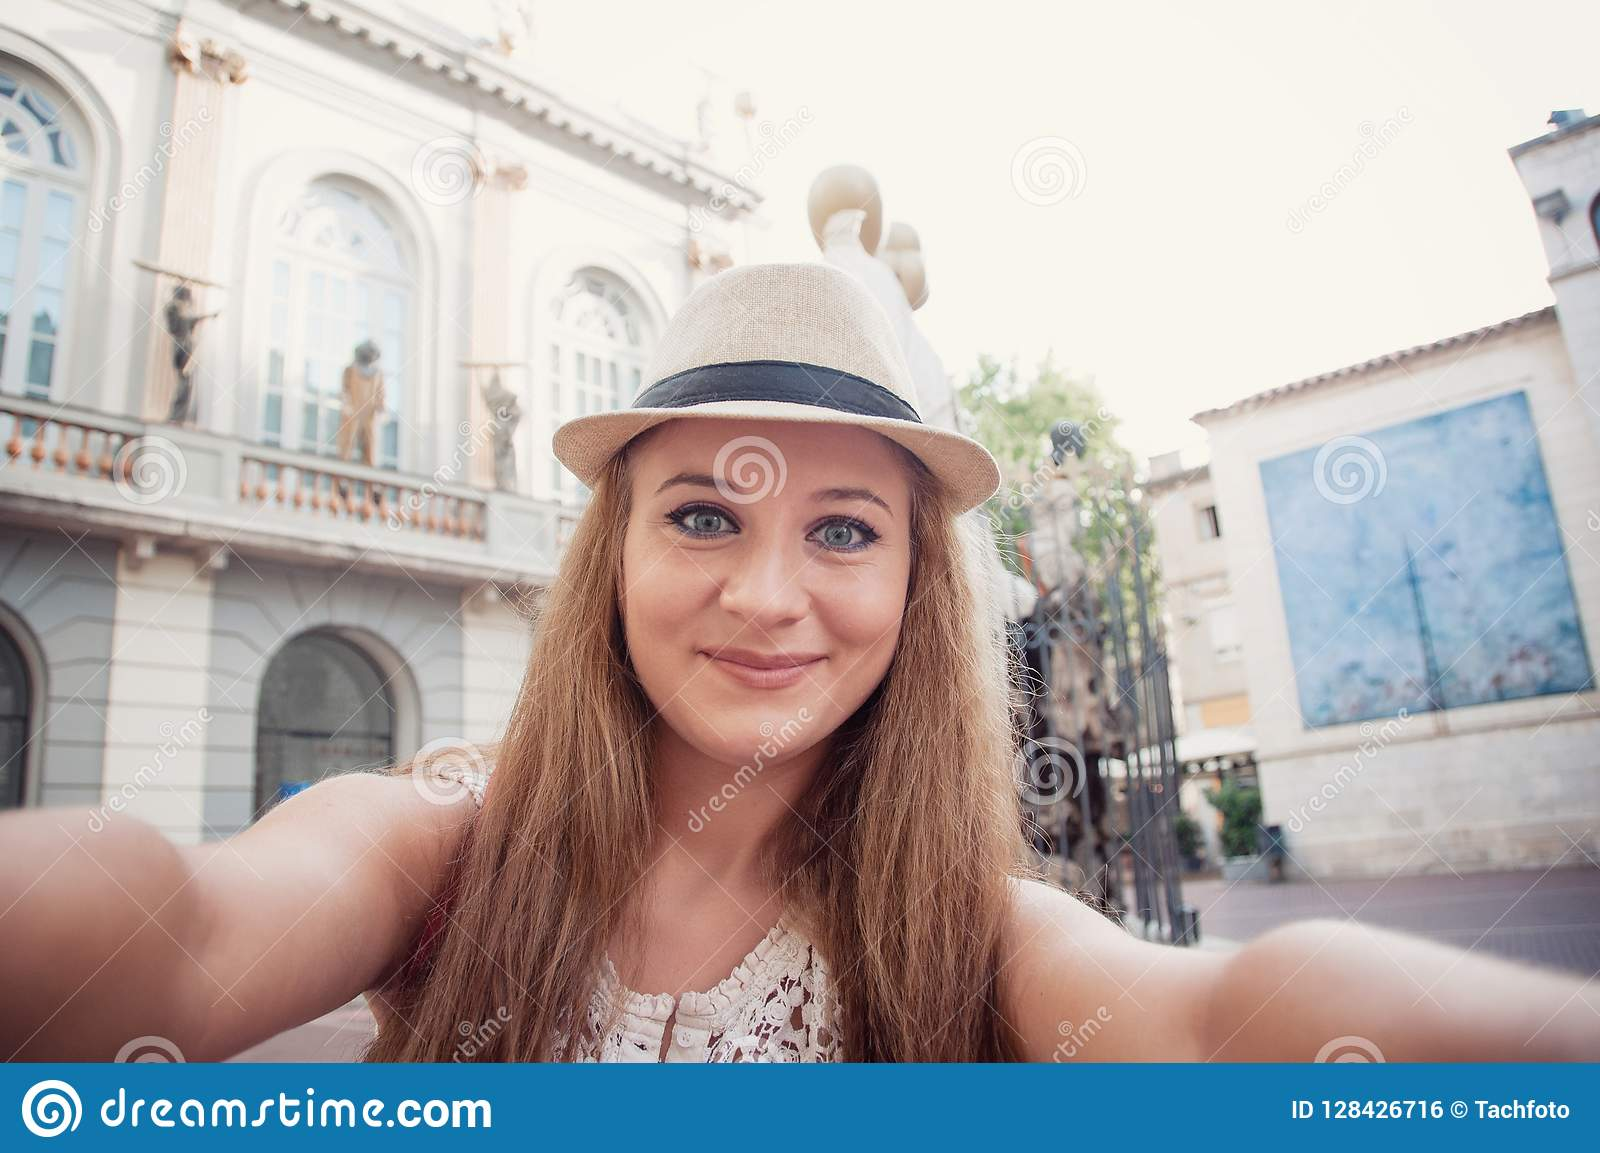 Closeup selfie-portrait of funny attractive girl tourist smiling